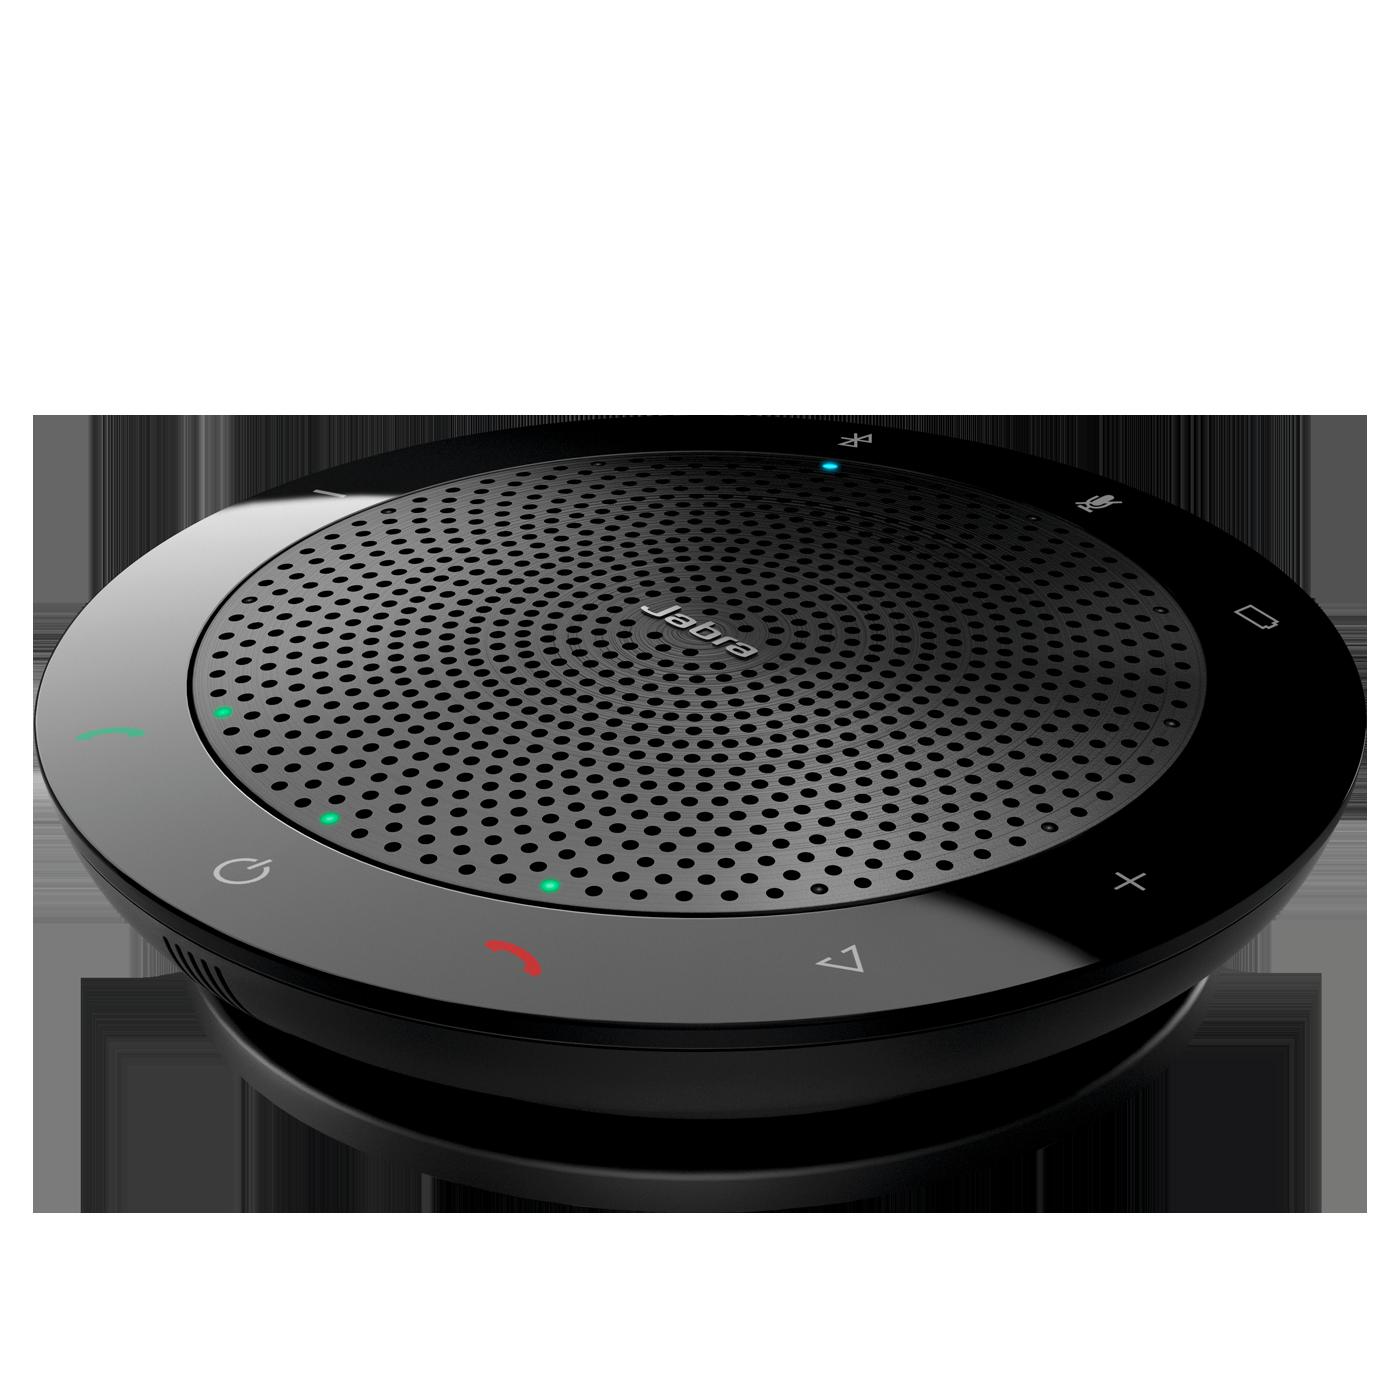 Loa hội nghị không dây Bluetooth Jabra SPEAK 510MS